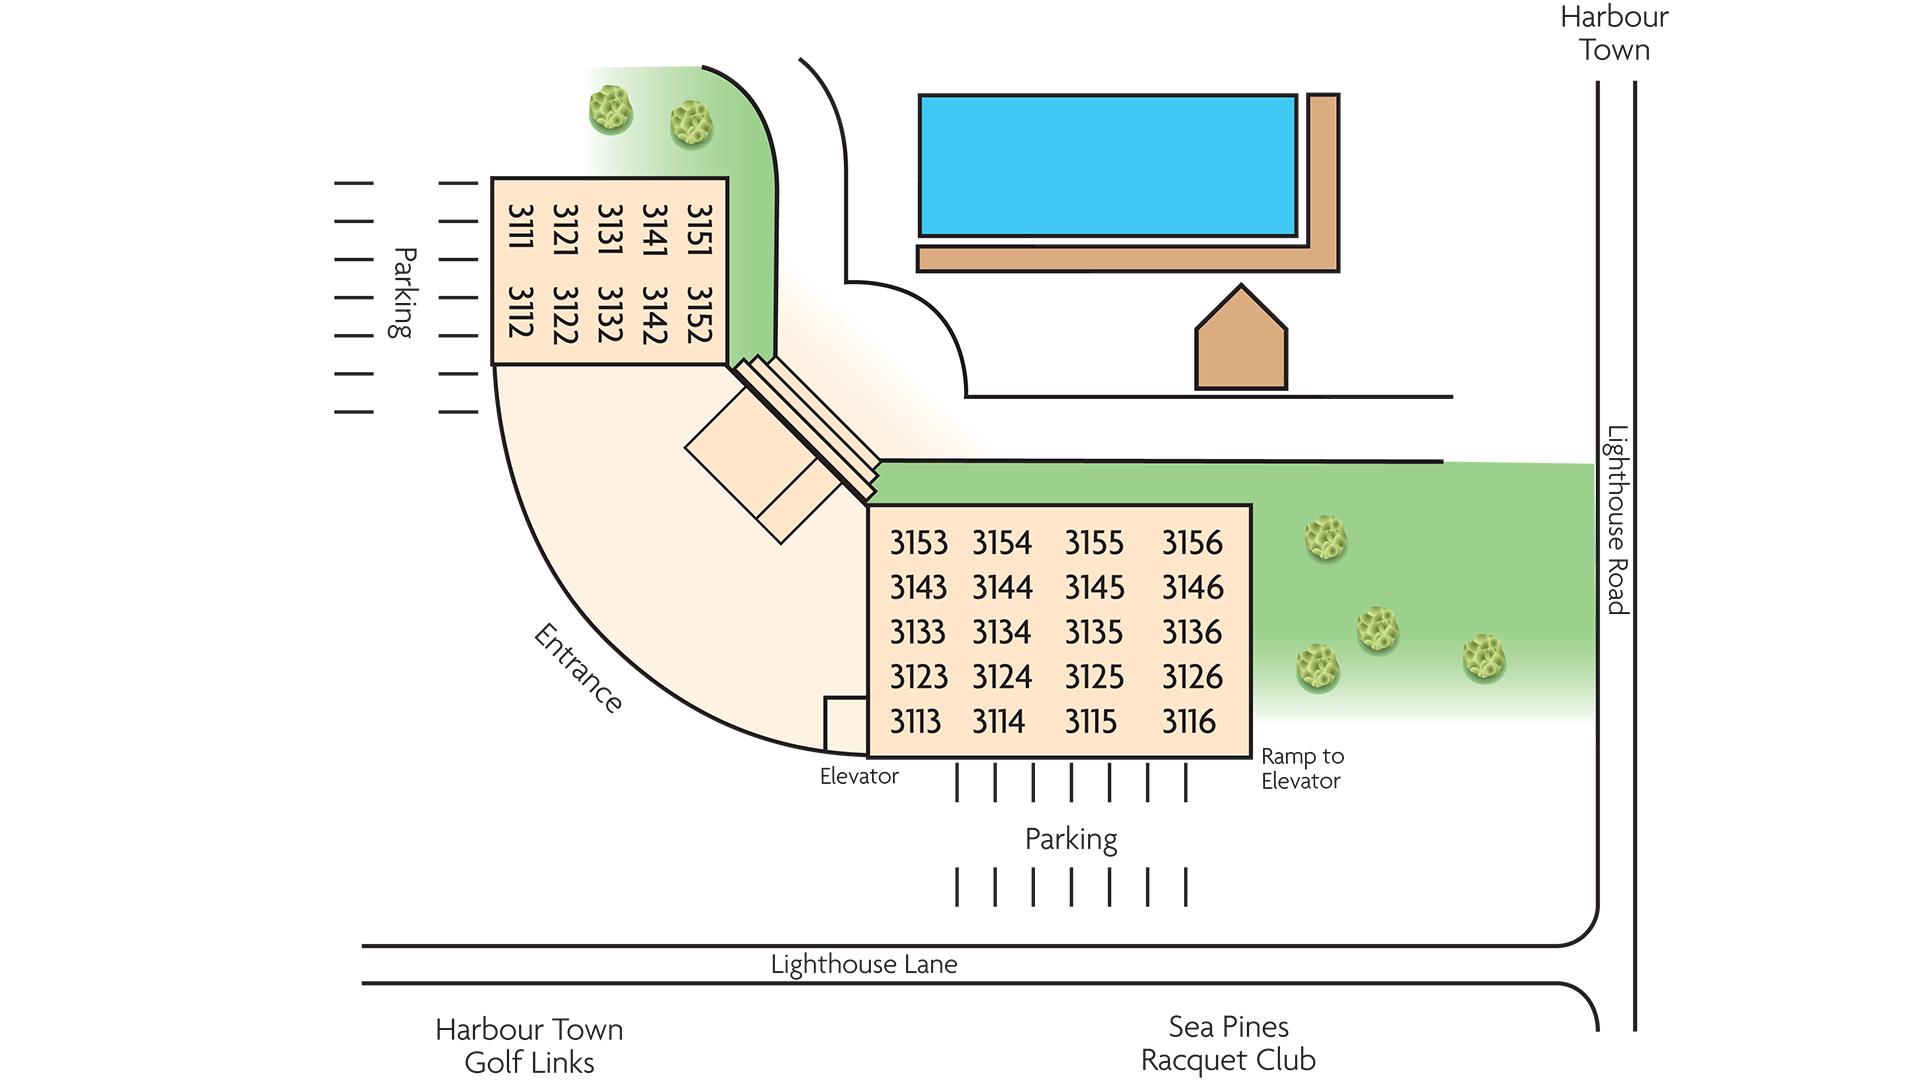 Map | Marriott's Heritage Club Sea Pines Resort Map on harvard university map, wyndham ocean ridge map, harbour town golf links map, cape cod rail trail map, atlanta map, palmetto dunes map, marriott's surfwatch map, beaufort map, port royal map, hilton head neighborhood map, florida map,